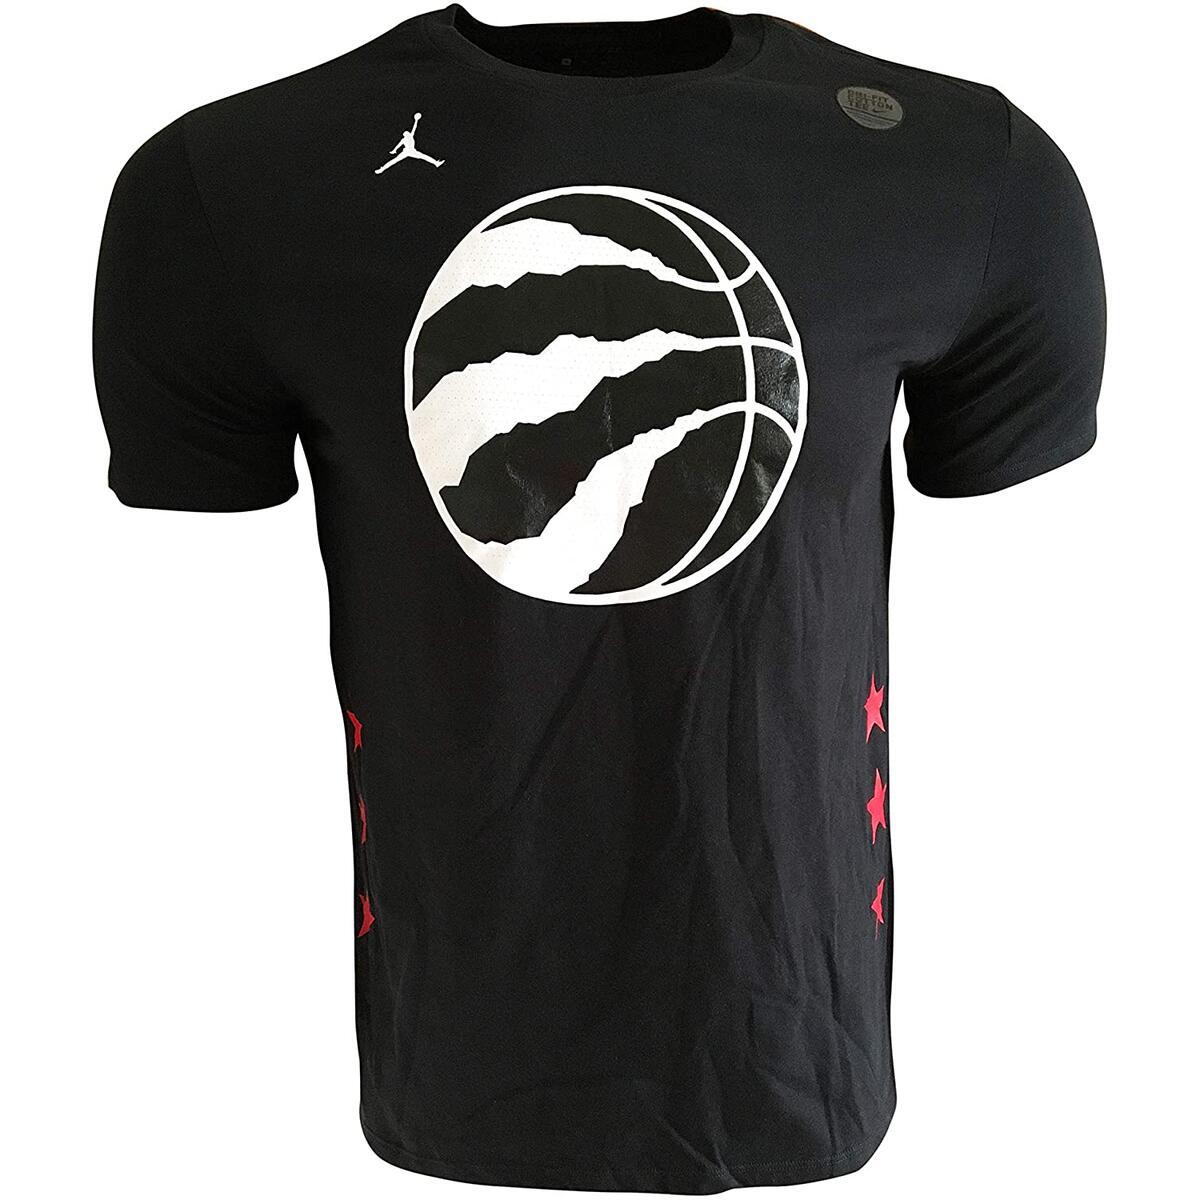 Nike Men's Kawhi Leonard #2 Toronto Raptors T-Shirt Black BQ2507 Cotton/Polyester Blend (Small)